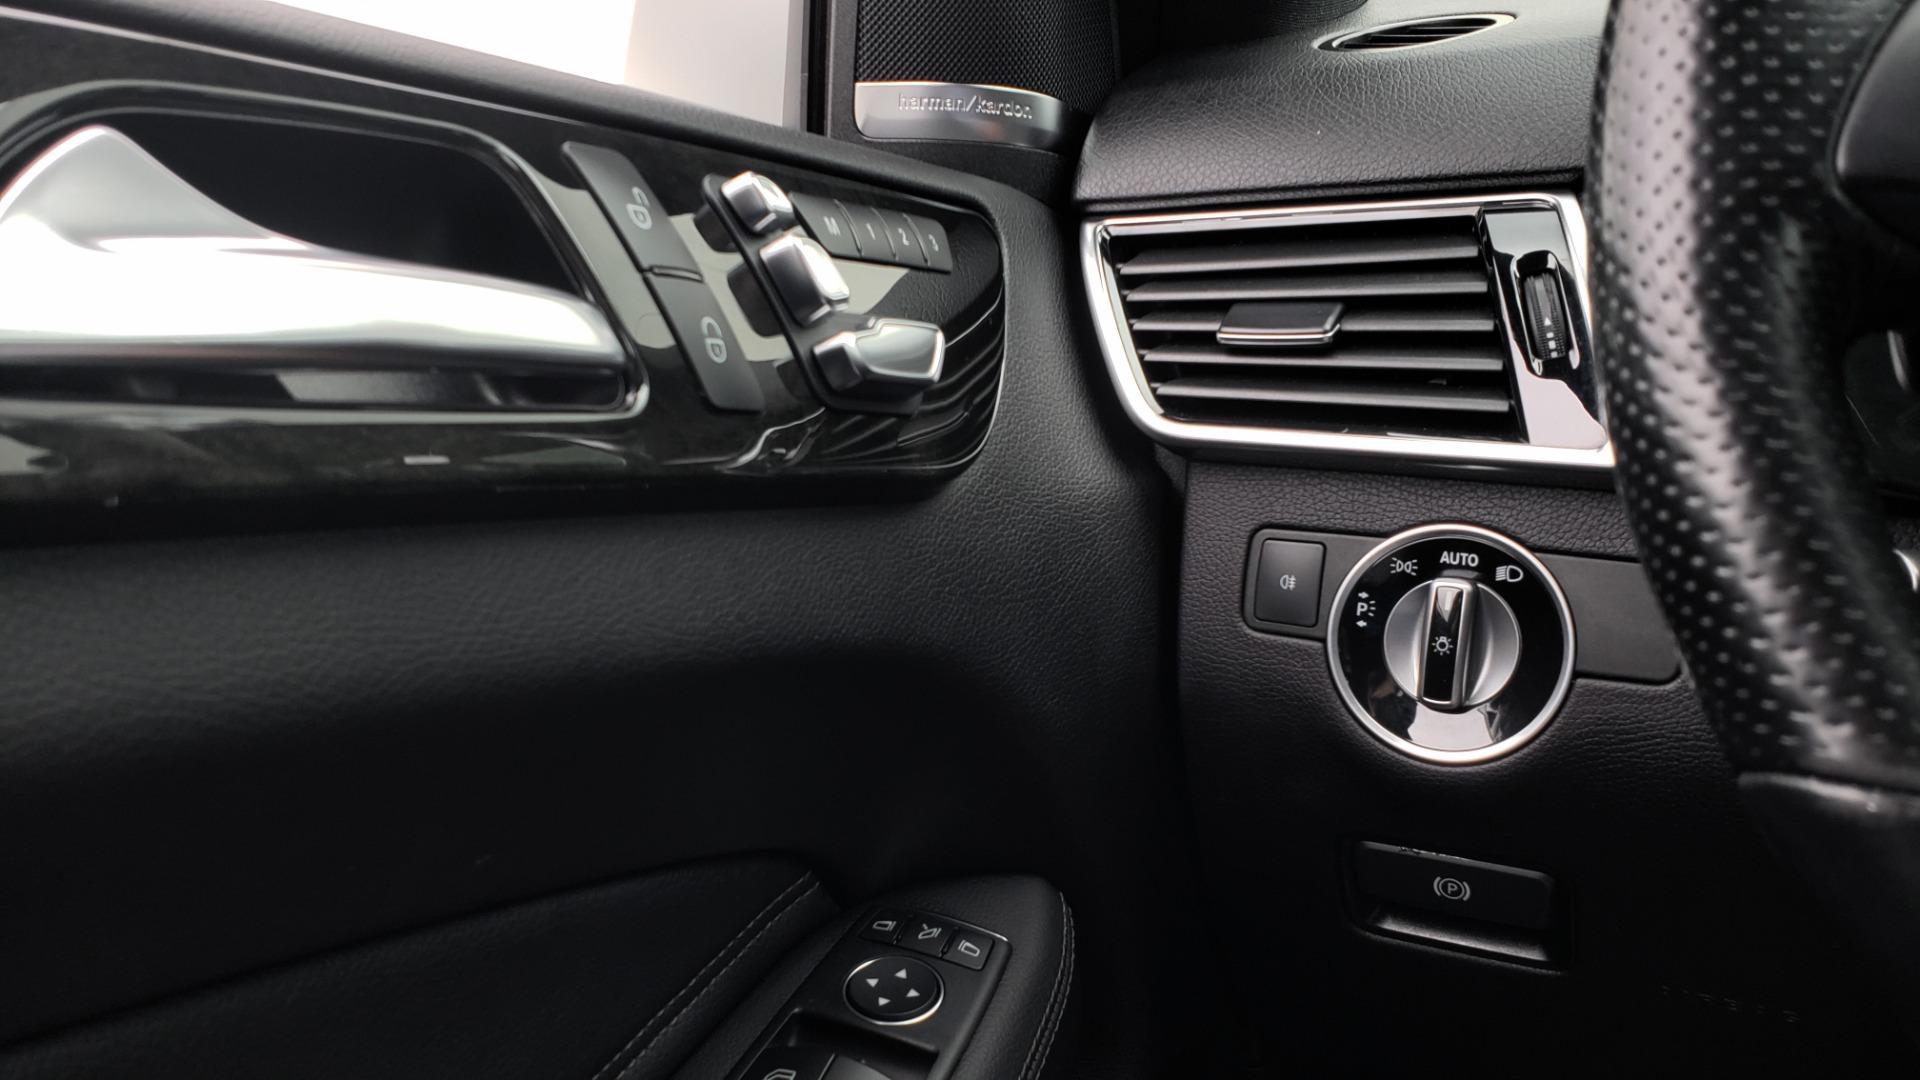 Used 2018 Mercedes-Benz GLE 350 4MATIC / PREM PKG / NAV / PARK ASST / K/H SND / HITCH / REARVIEW for sale $40,801 at Formula Imports in Charlotte NC 28227 42